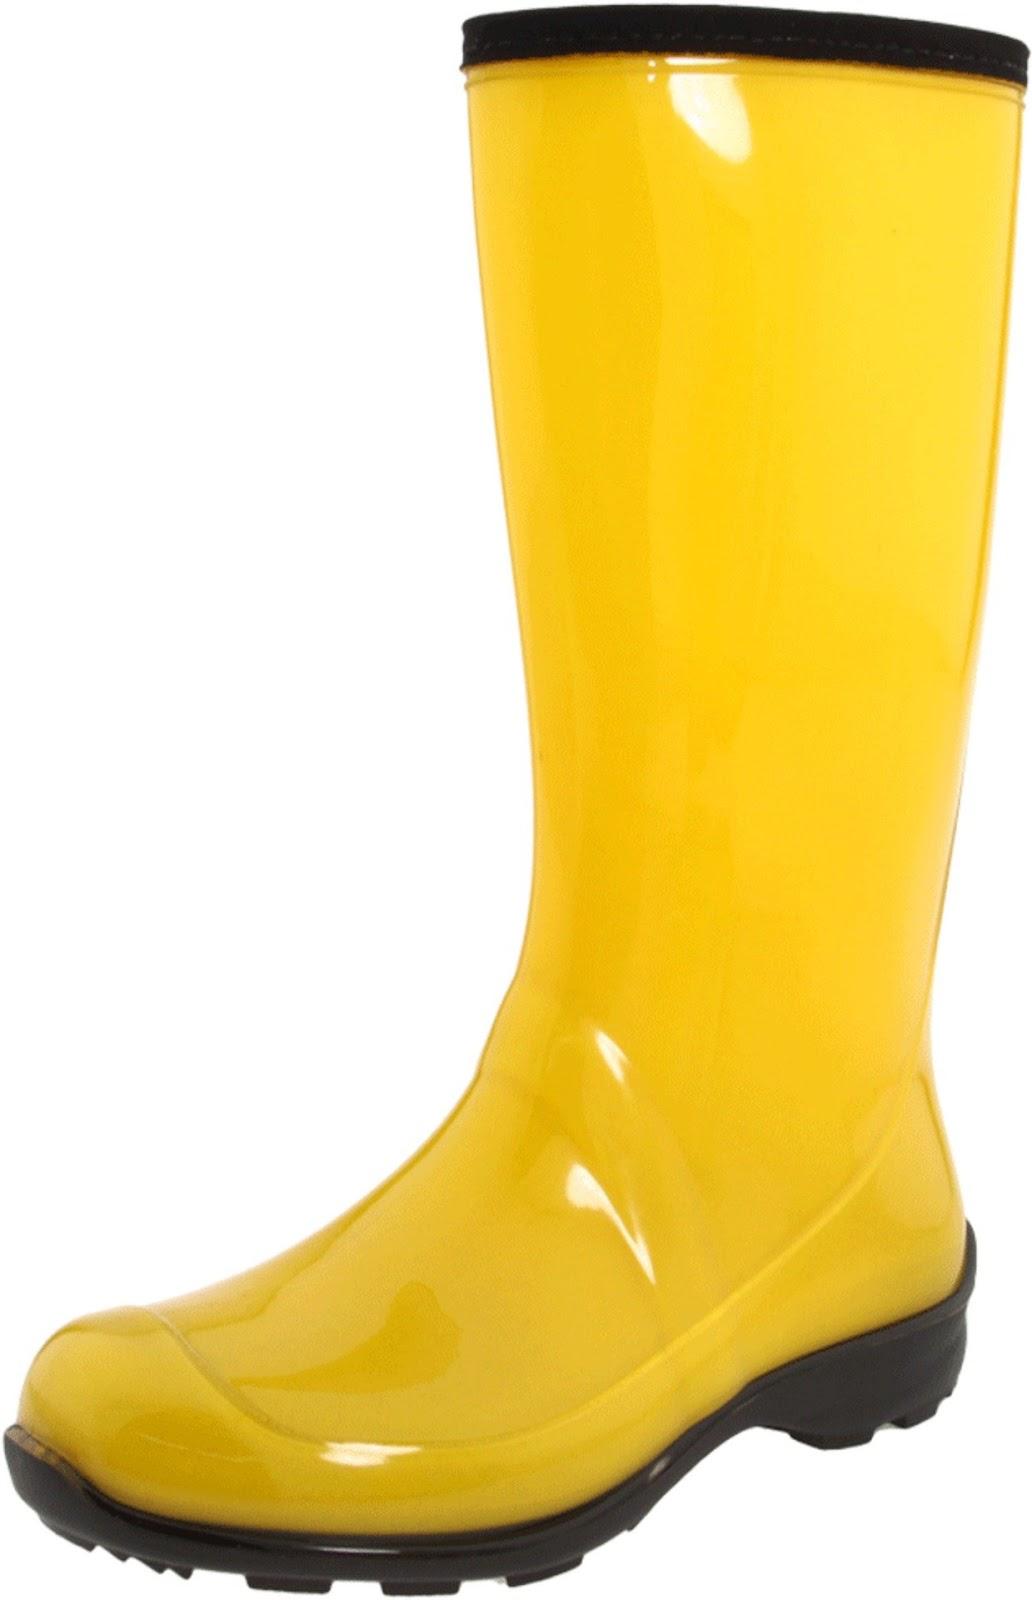 Yellow rain boot clipart graphic free stock Yellow Rain Boots - Viewing | Clipart Panda - Free Clipart ... graphic free stock